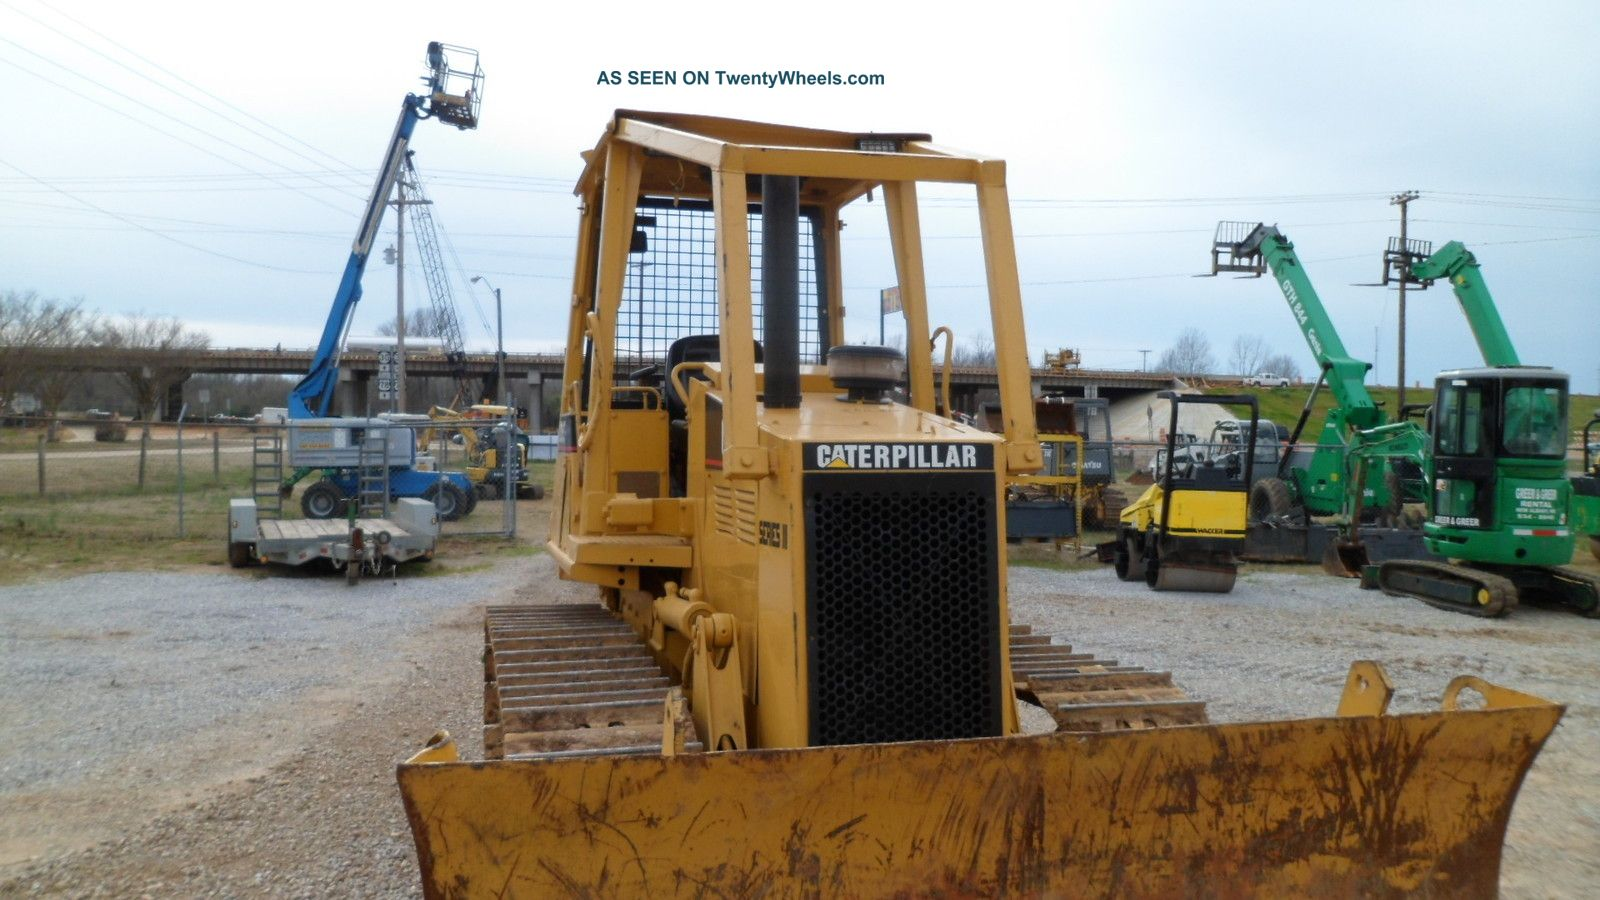 Caterpillar D5c Series 3 Dozer Bulldozer